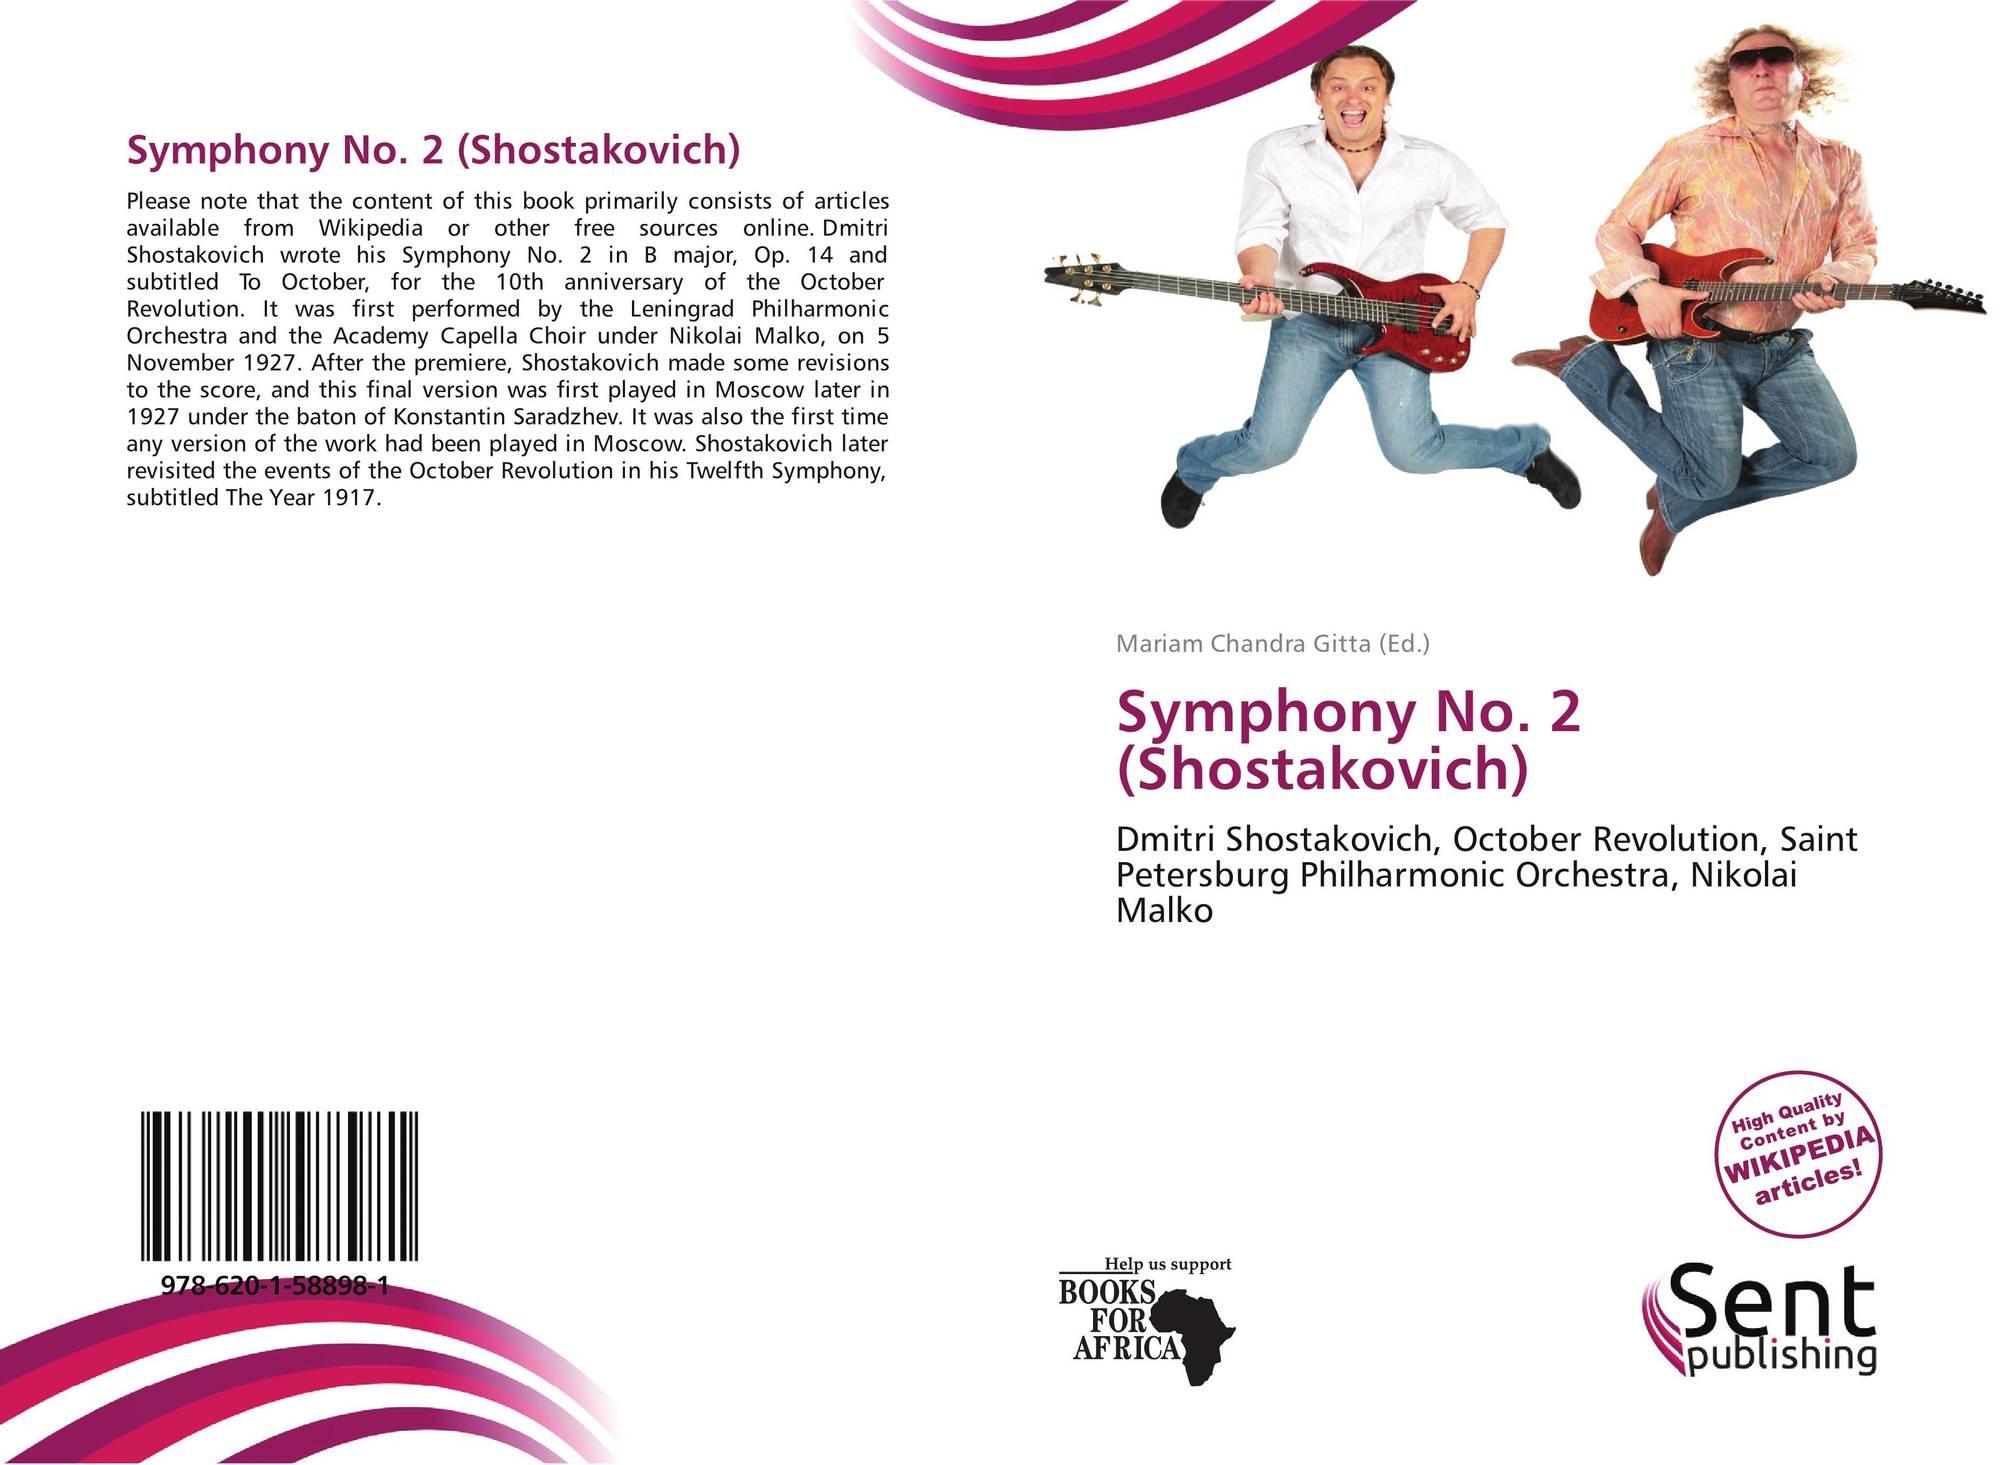 Symphony No  2 (Shostakovich), 978-620-1-58898-1, 6201588981